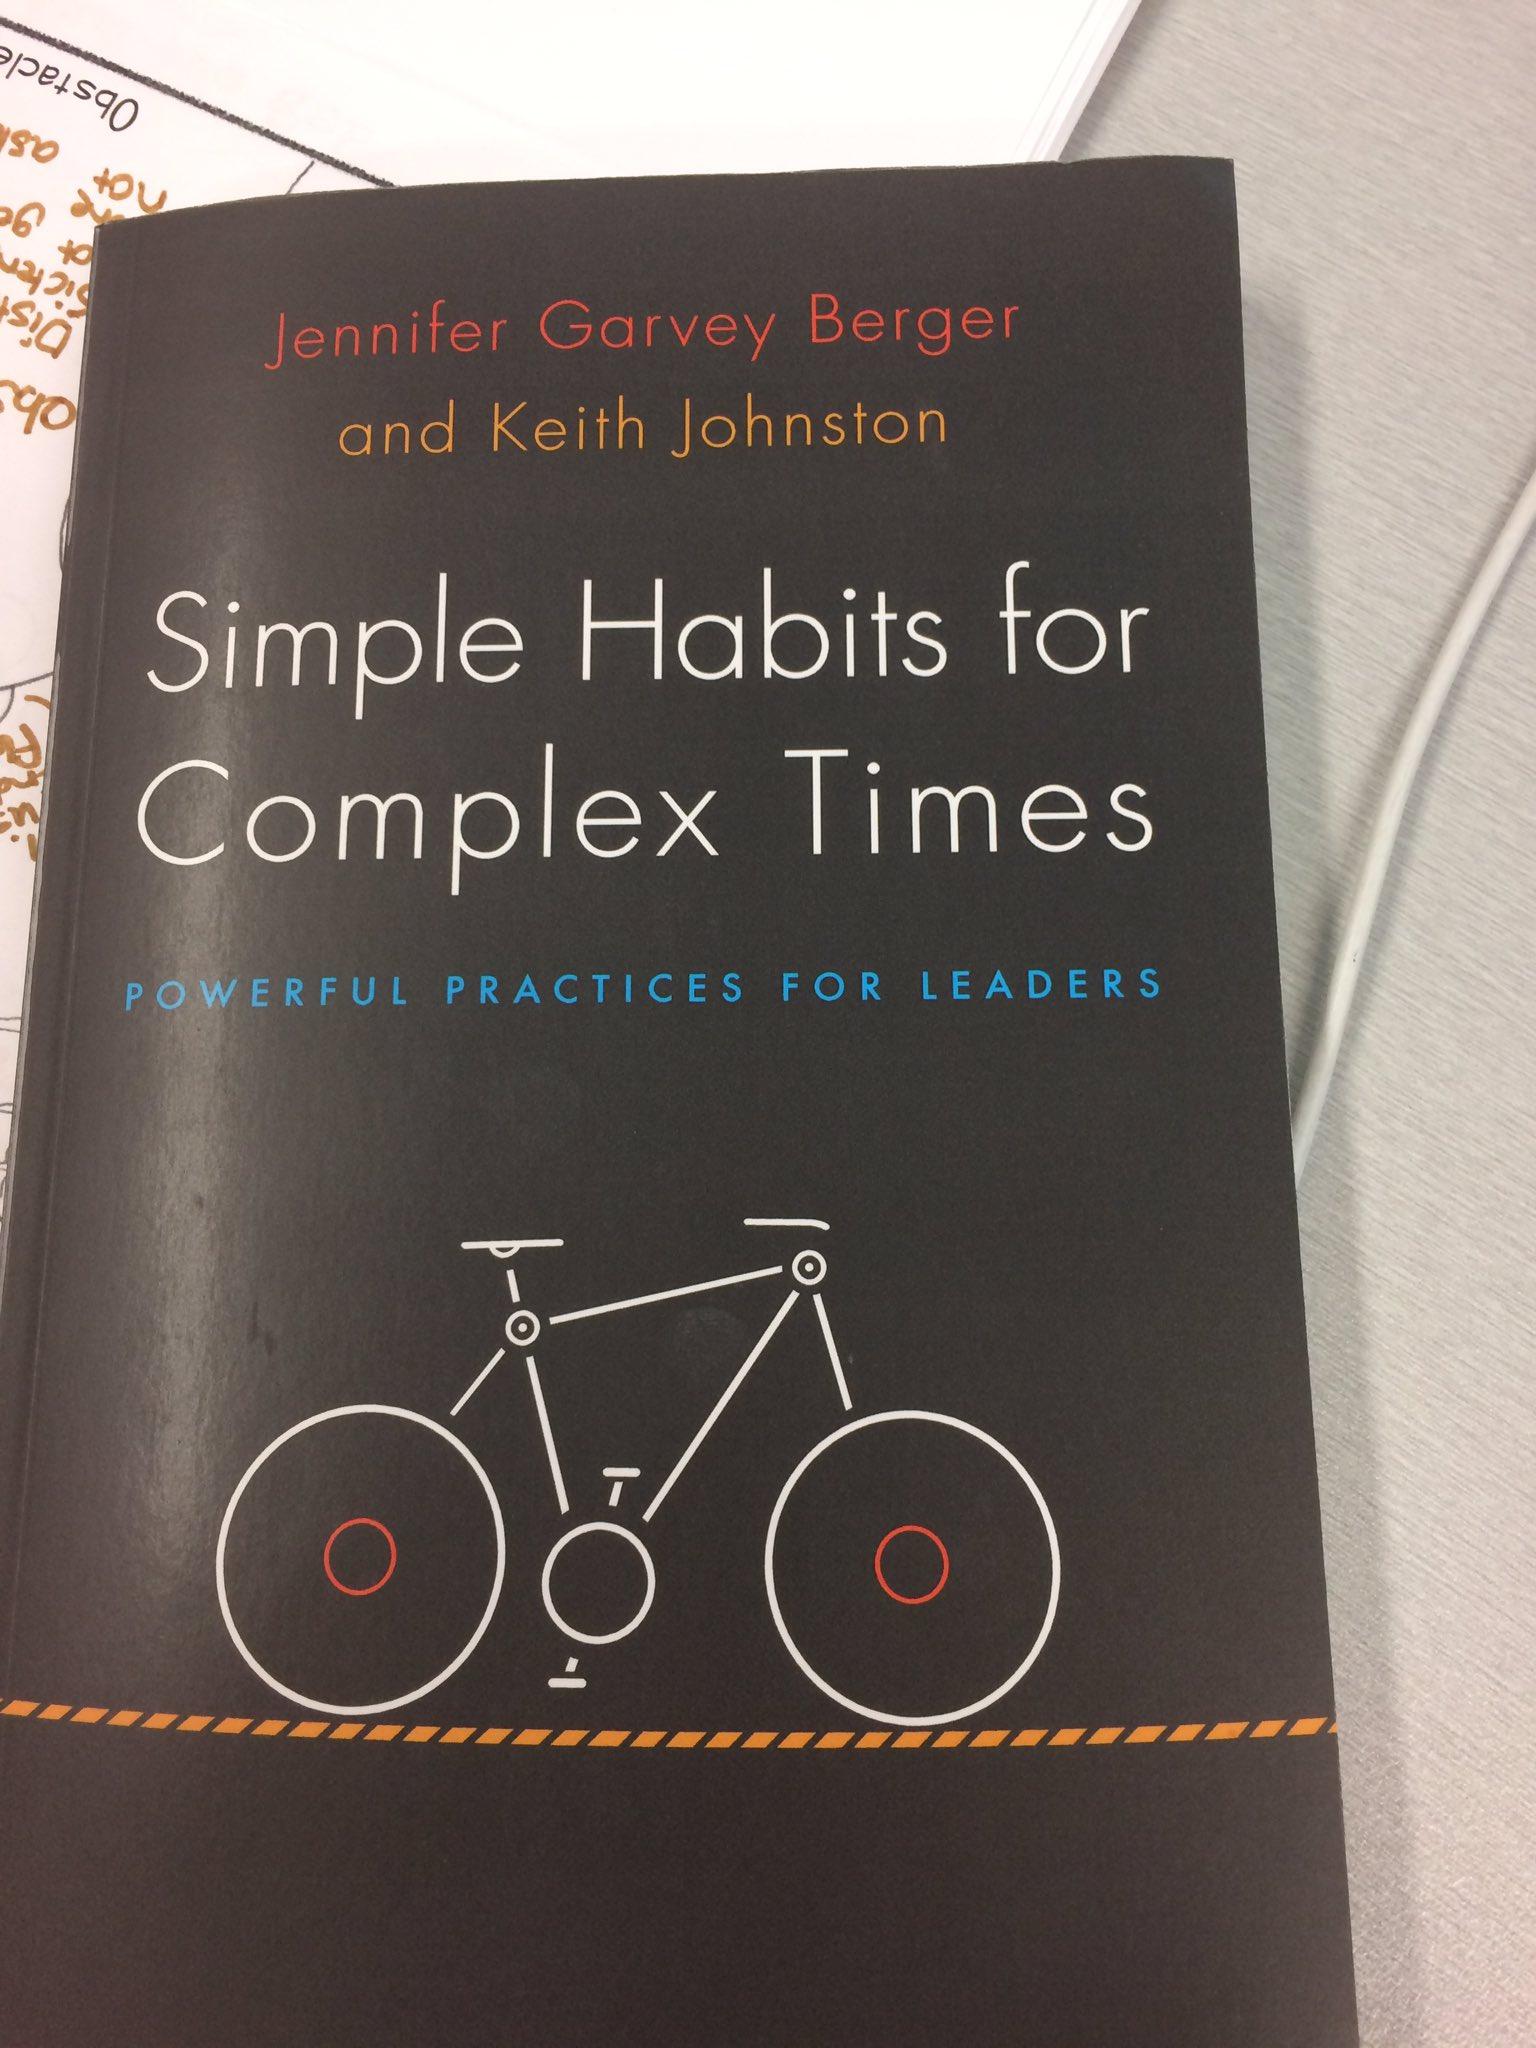 Ooo look what I got :)! Thanks @edgeworknz1 @jgberger cc: @MissDtheTeacher This & @Kerileef Learning Futures all in 1 week :)! @gingamusings https://t.co/bZKwzTpVcd